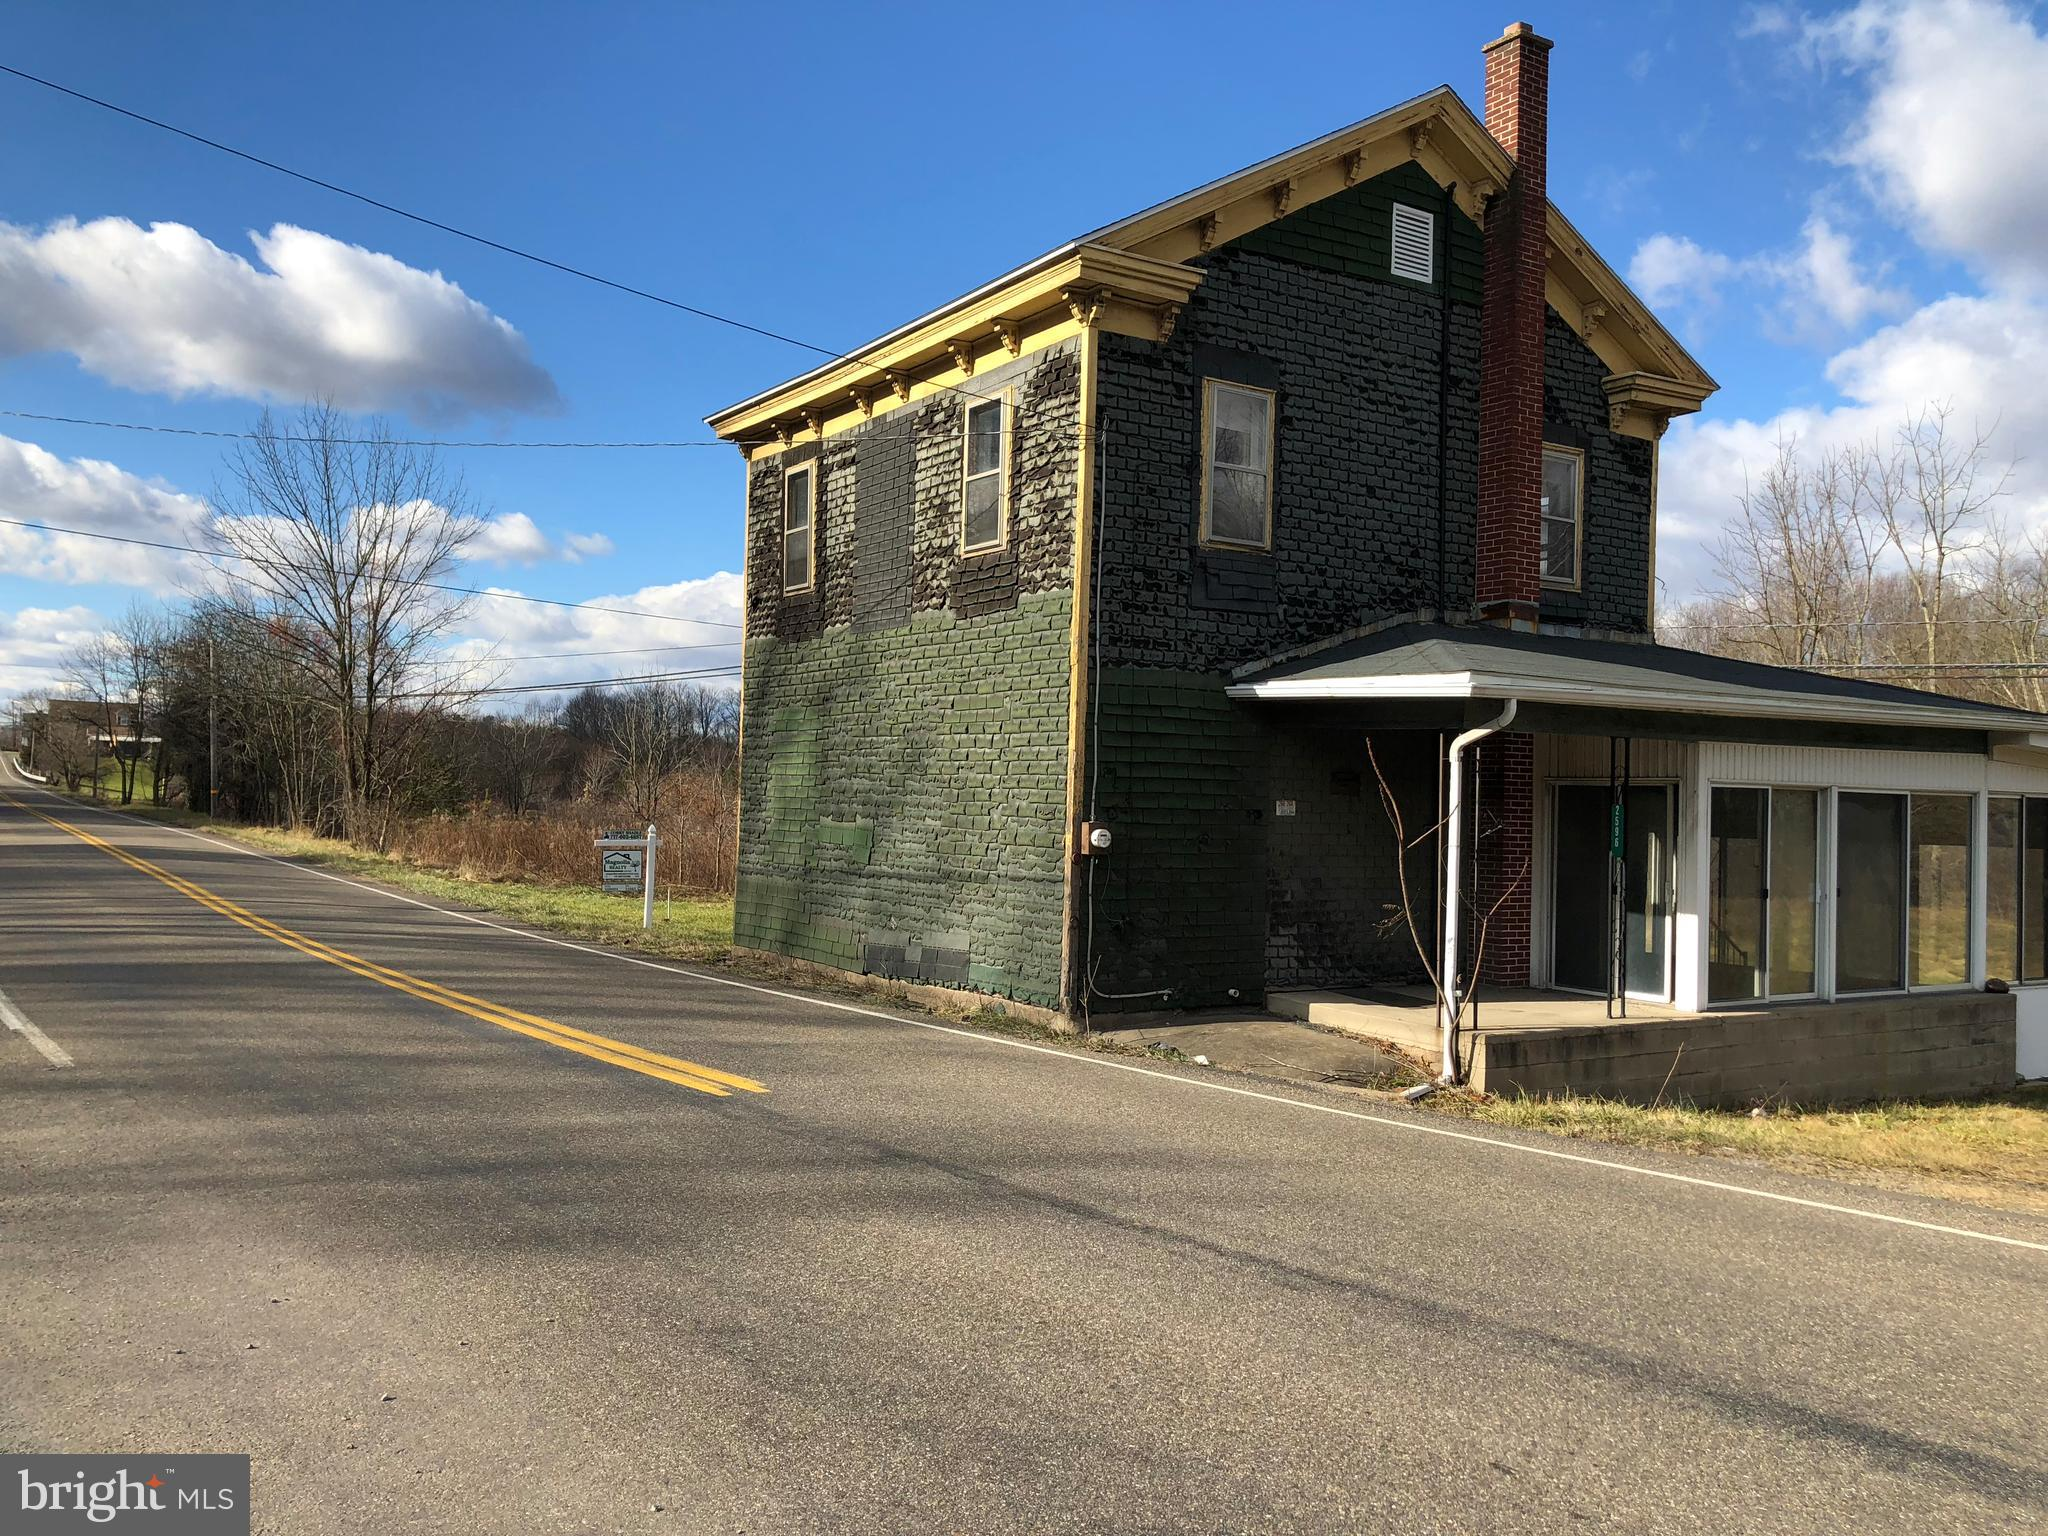 2596 W MAIN STREET, SPRING GLEN, PA 17978